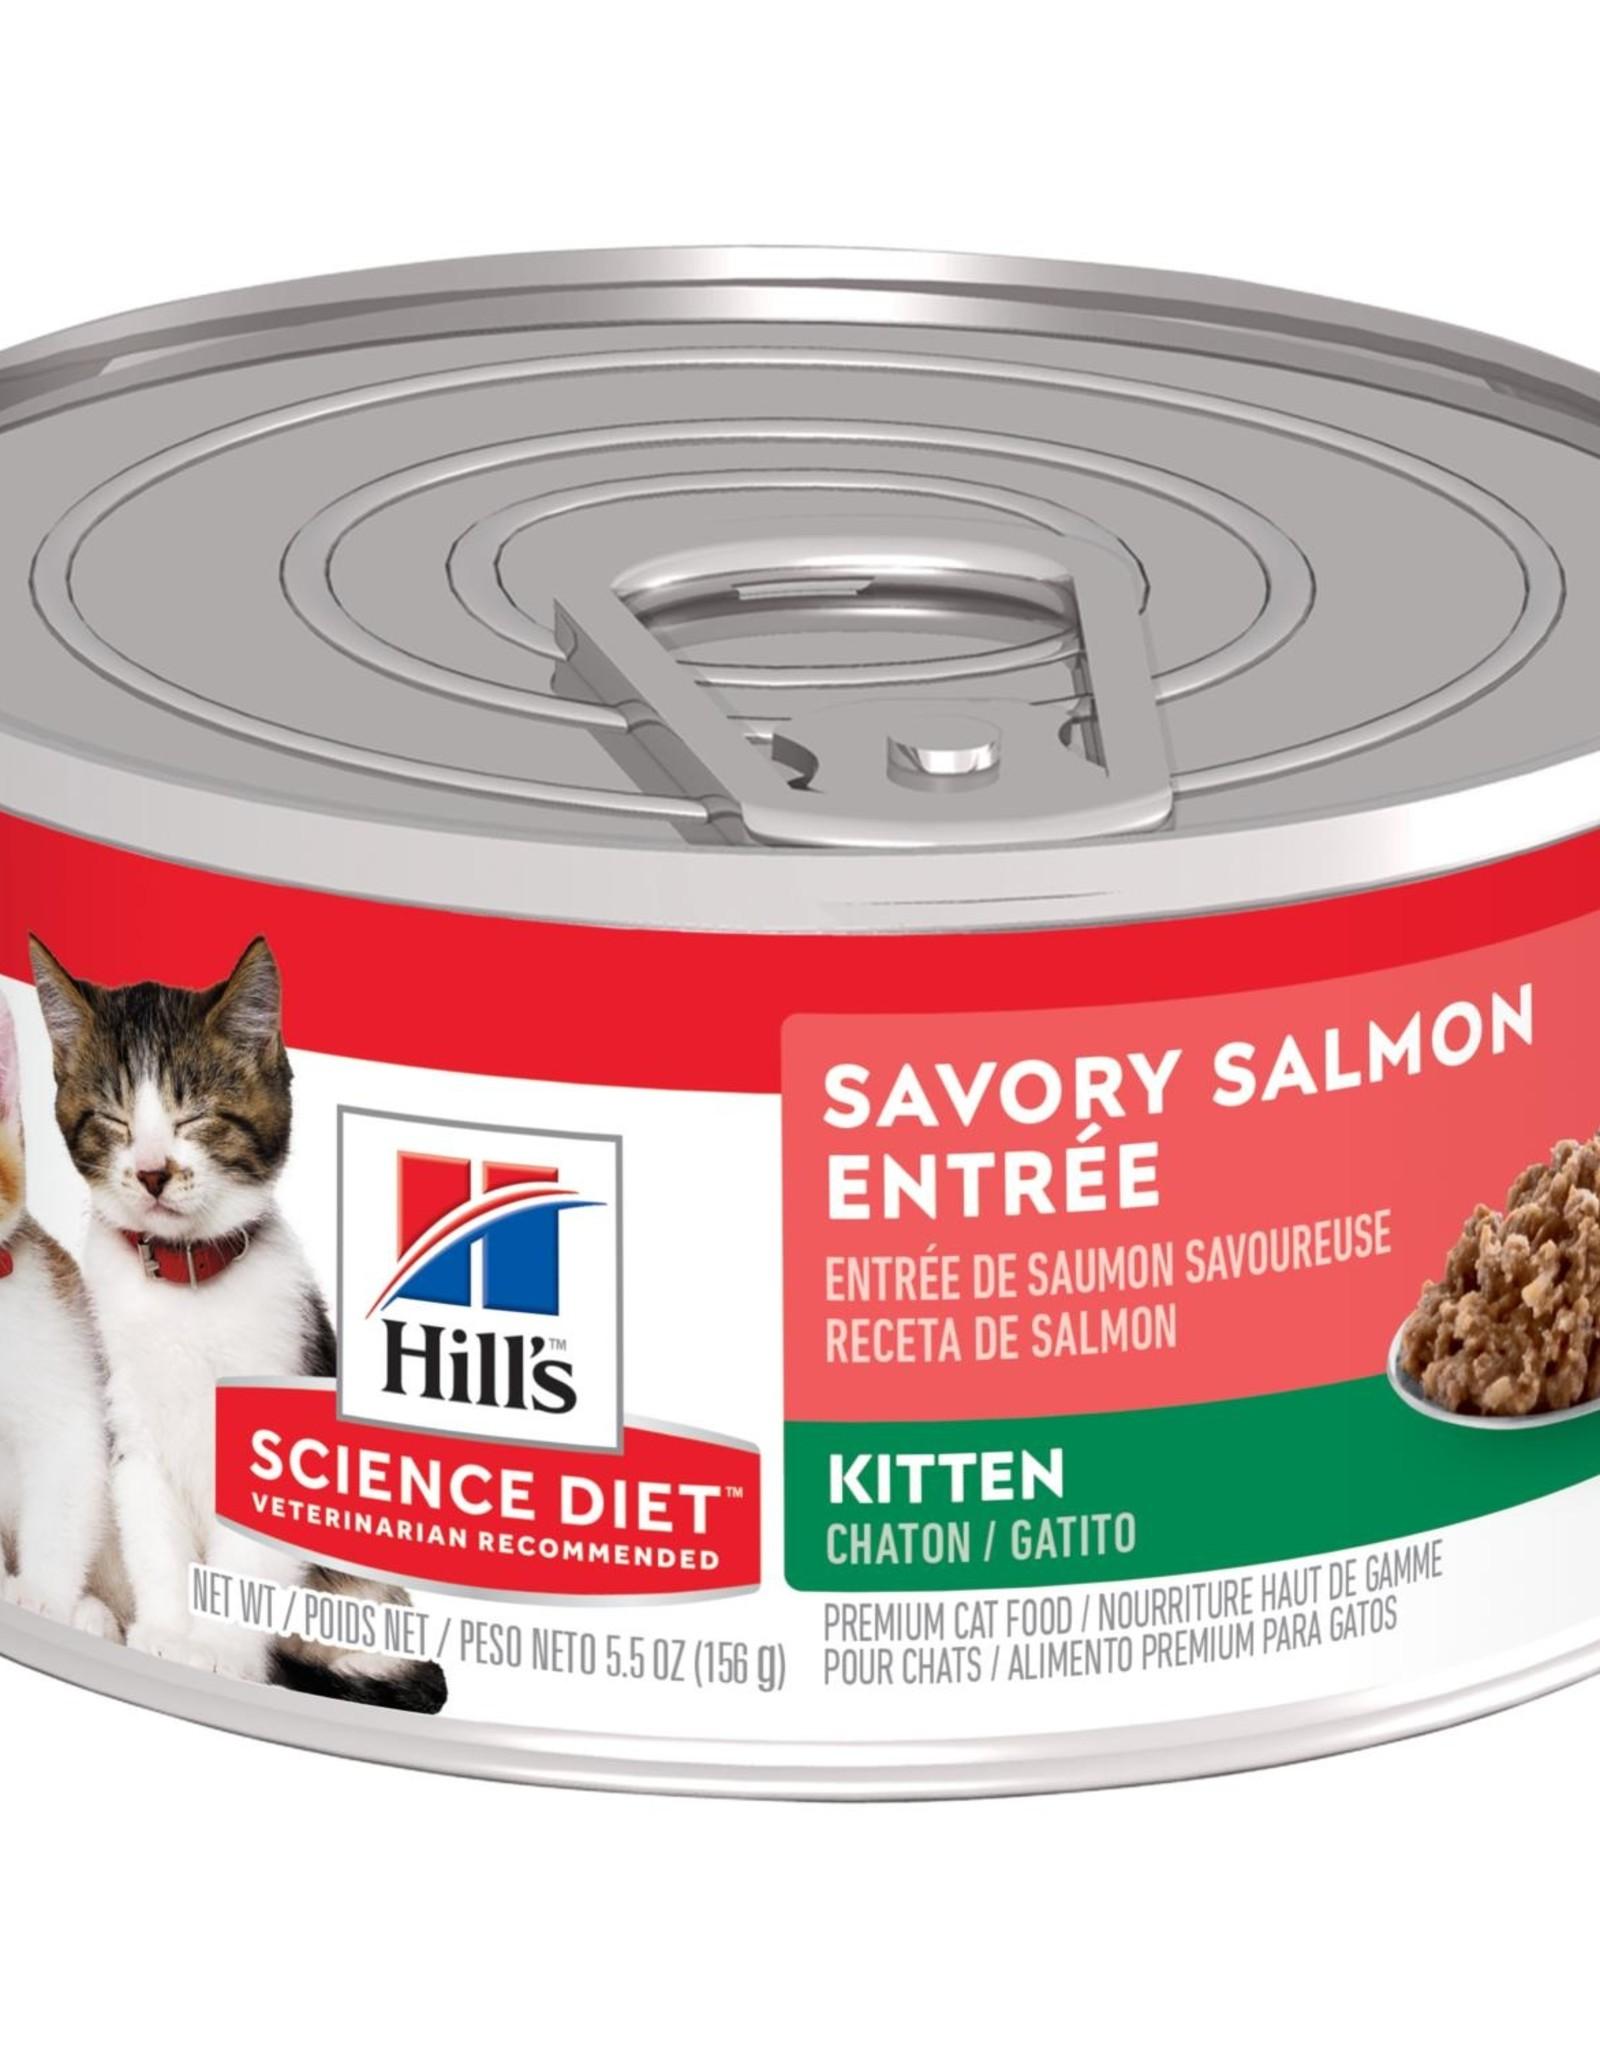 SCIENCE DIET HILL'S SCIENCE DIET FELINE CAN KITTEN SAVORY SALMON 2.9OZ CASE OF 24